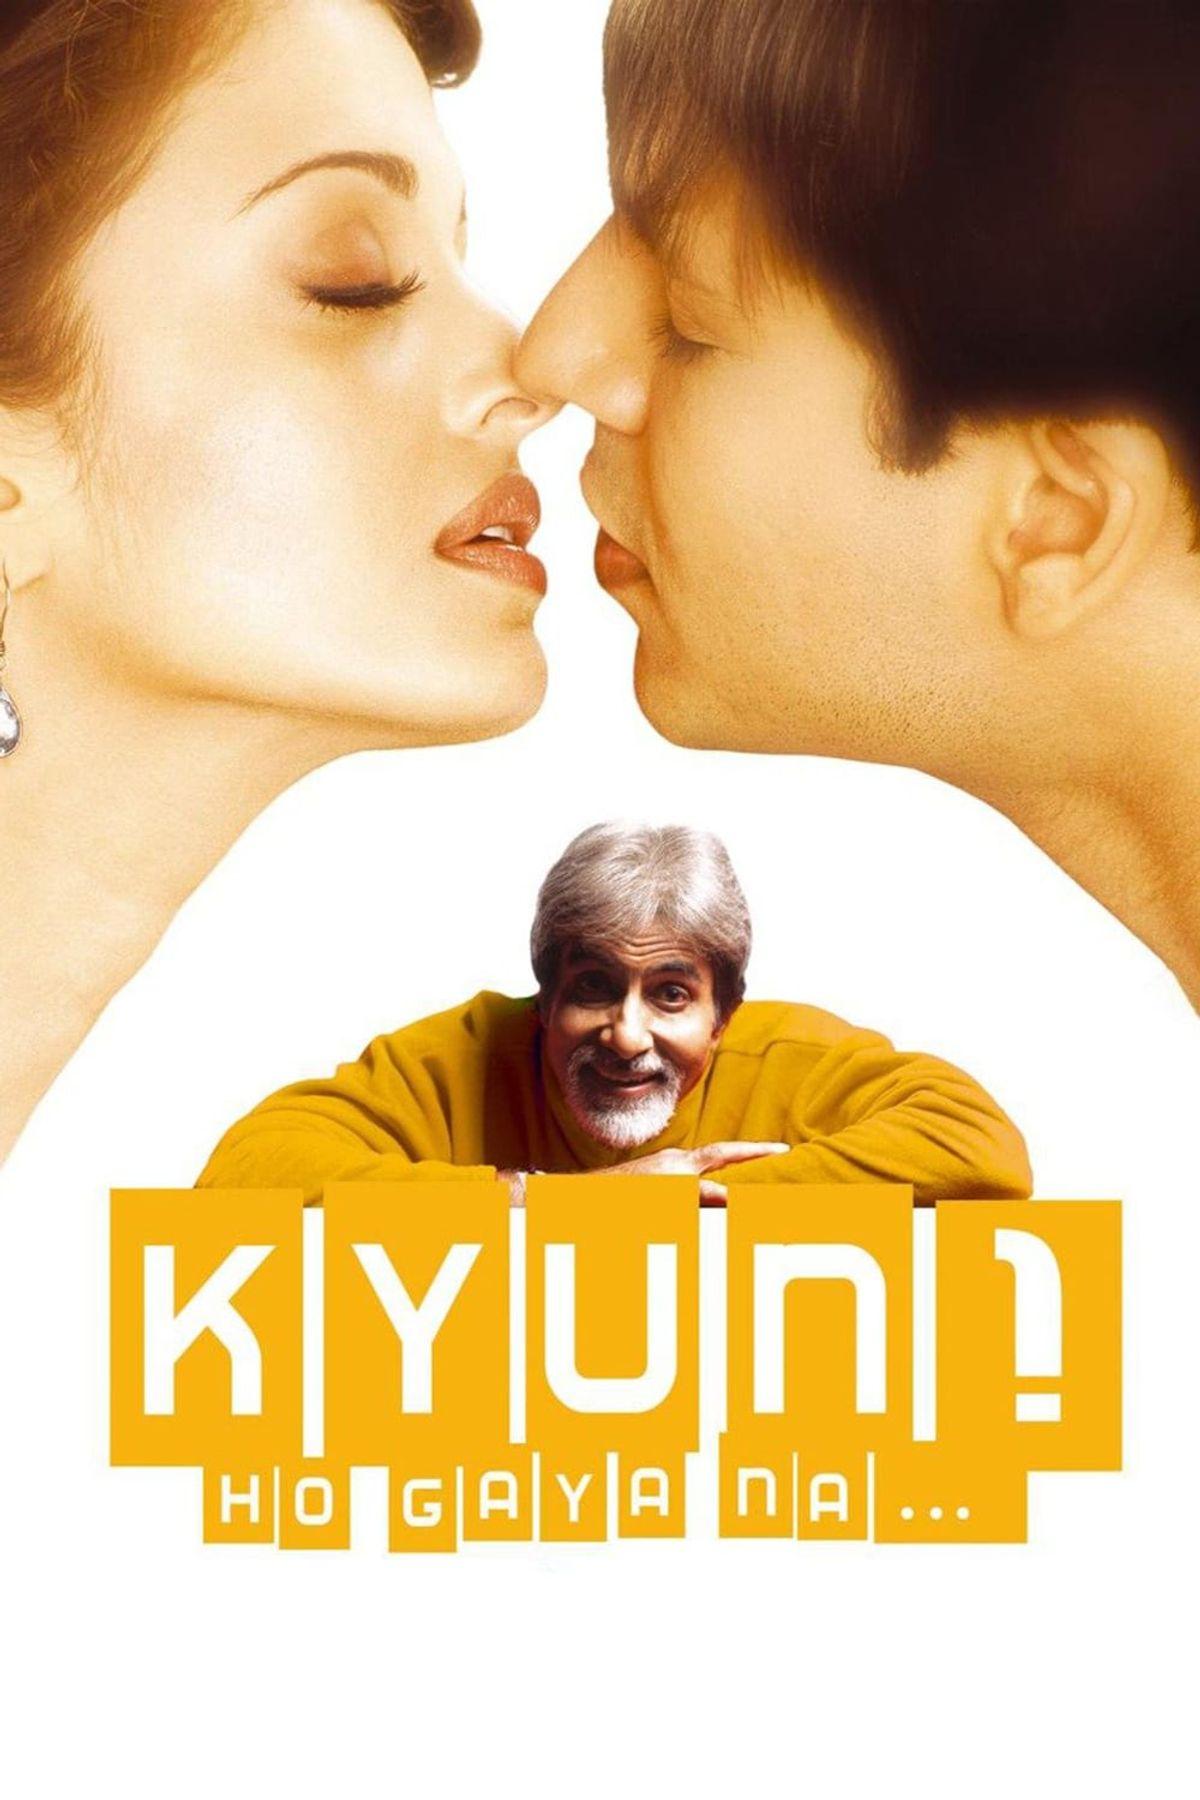 Samir Karnik Best Movies, TV Shows and Web Series List